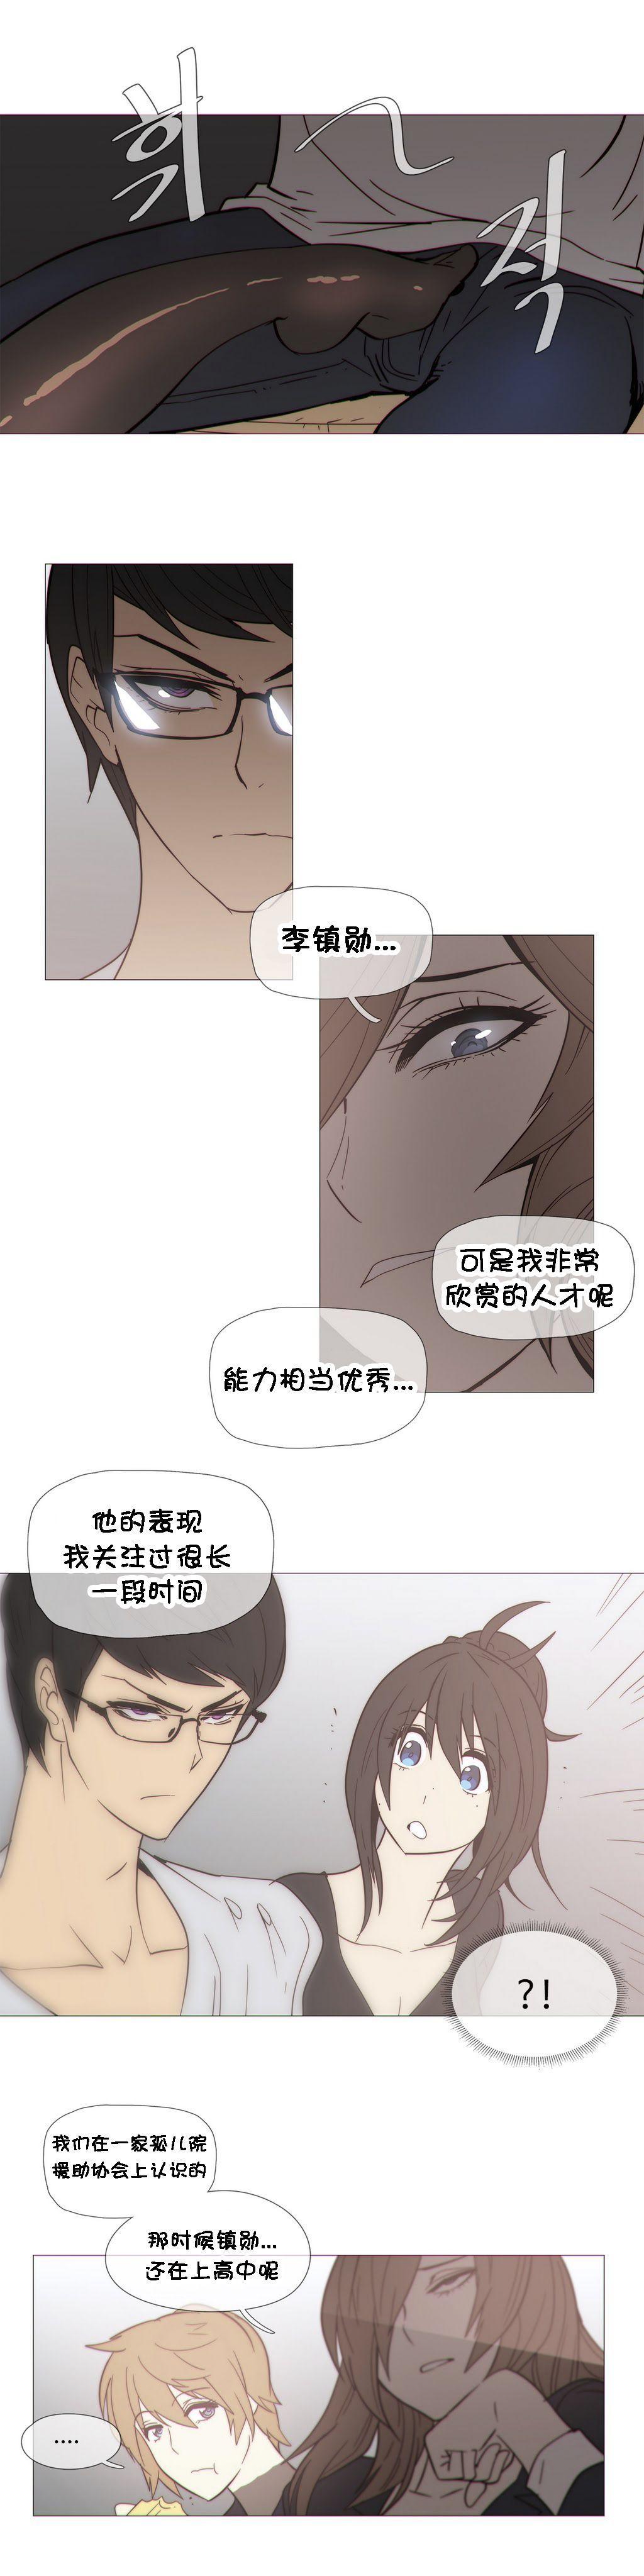 HouseHold Affairs 【卞赤鲤个人汉化】1~33话(持续更新中) 646